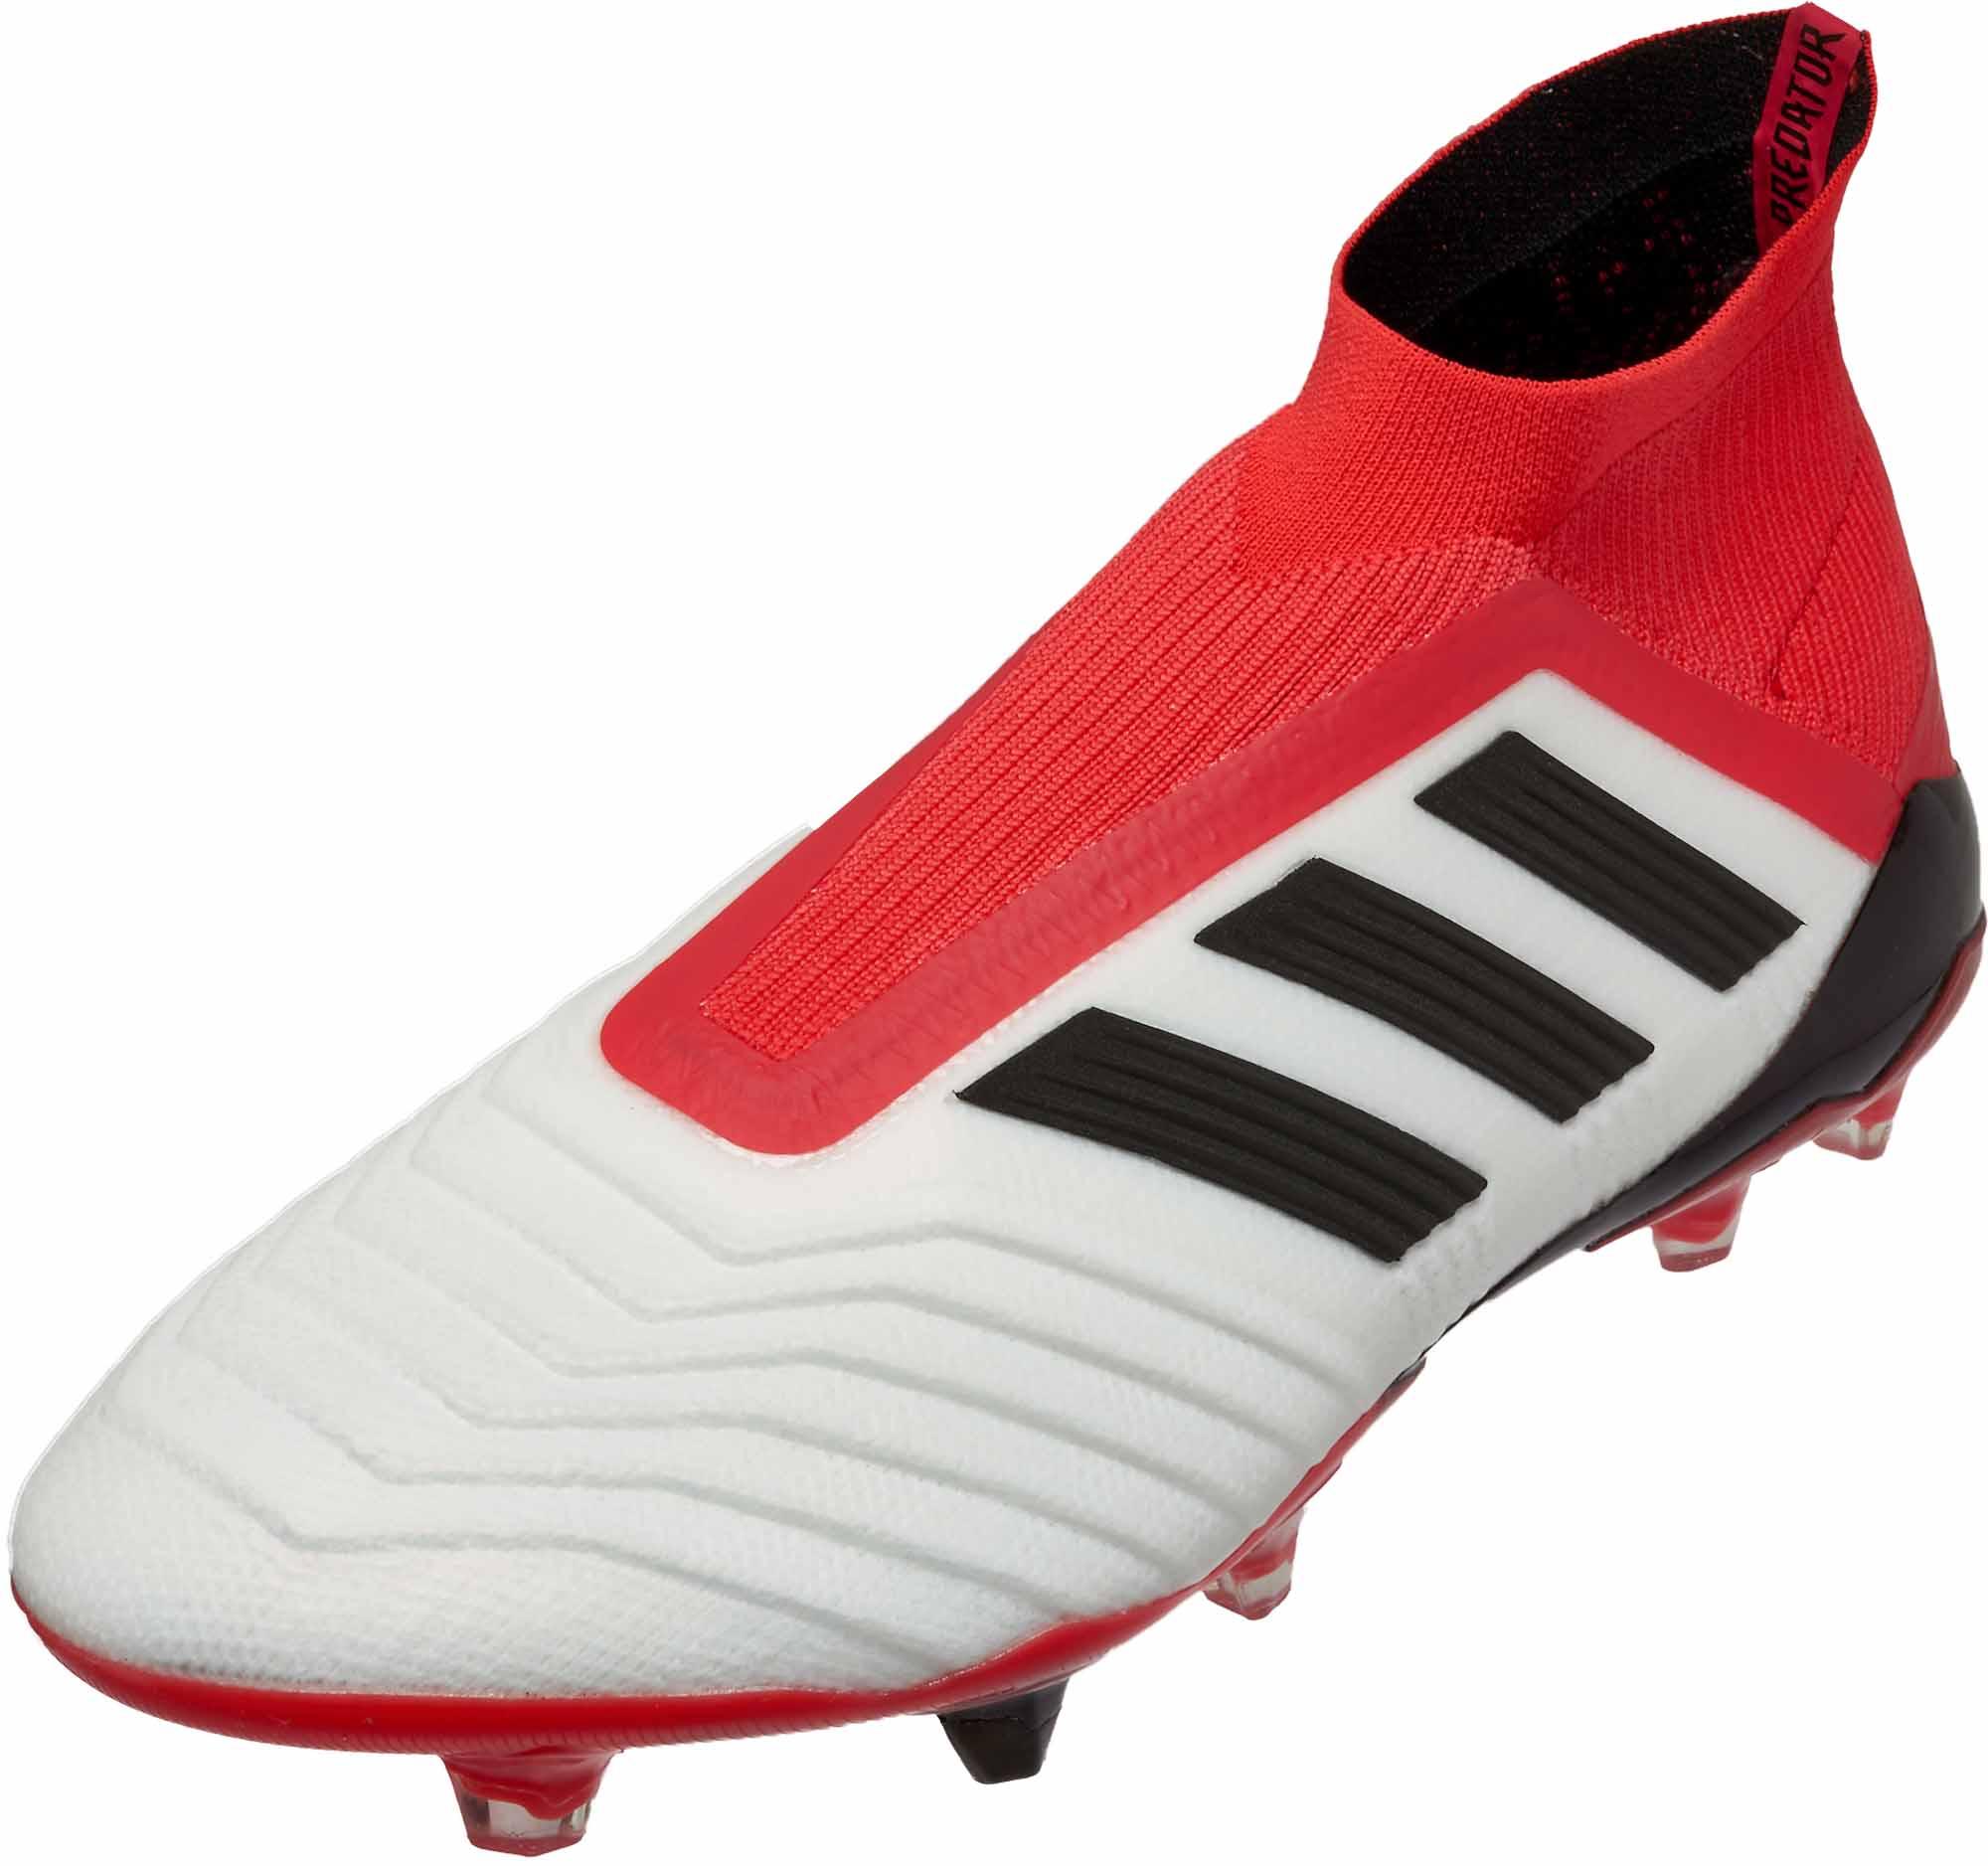 302d4 a6e92  new zealand adidas predator 18 fg white real coral soccer  master 0f7fb 9dbdd 56bf0c35c